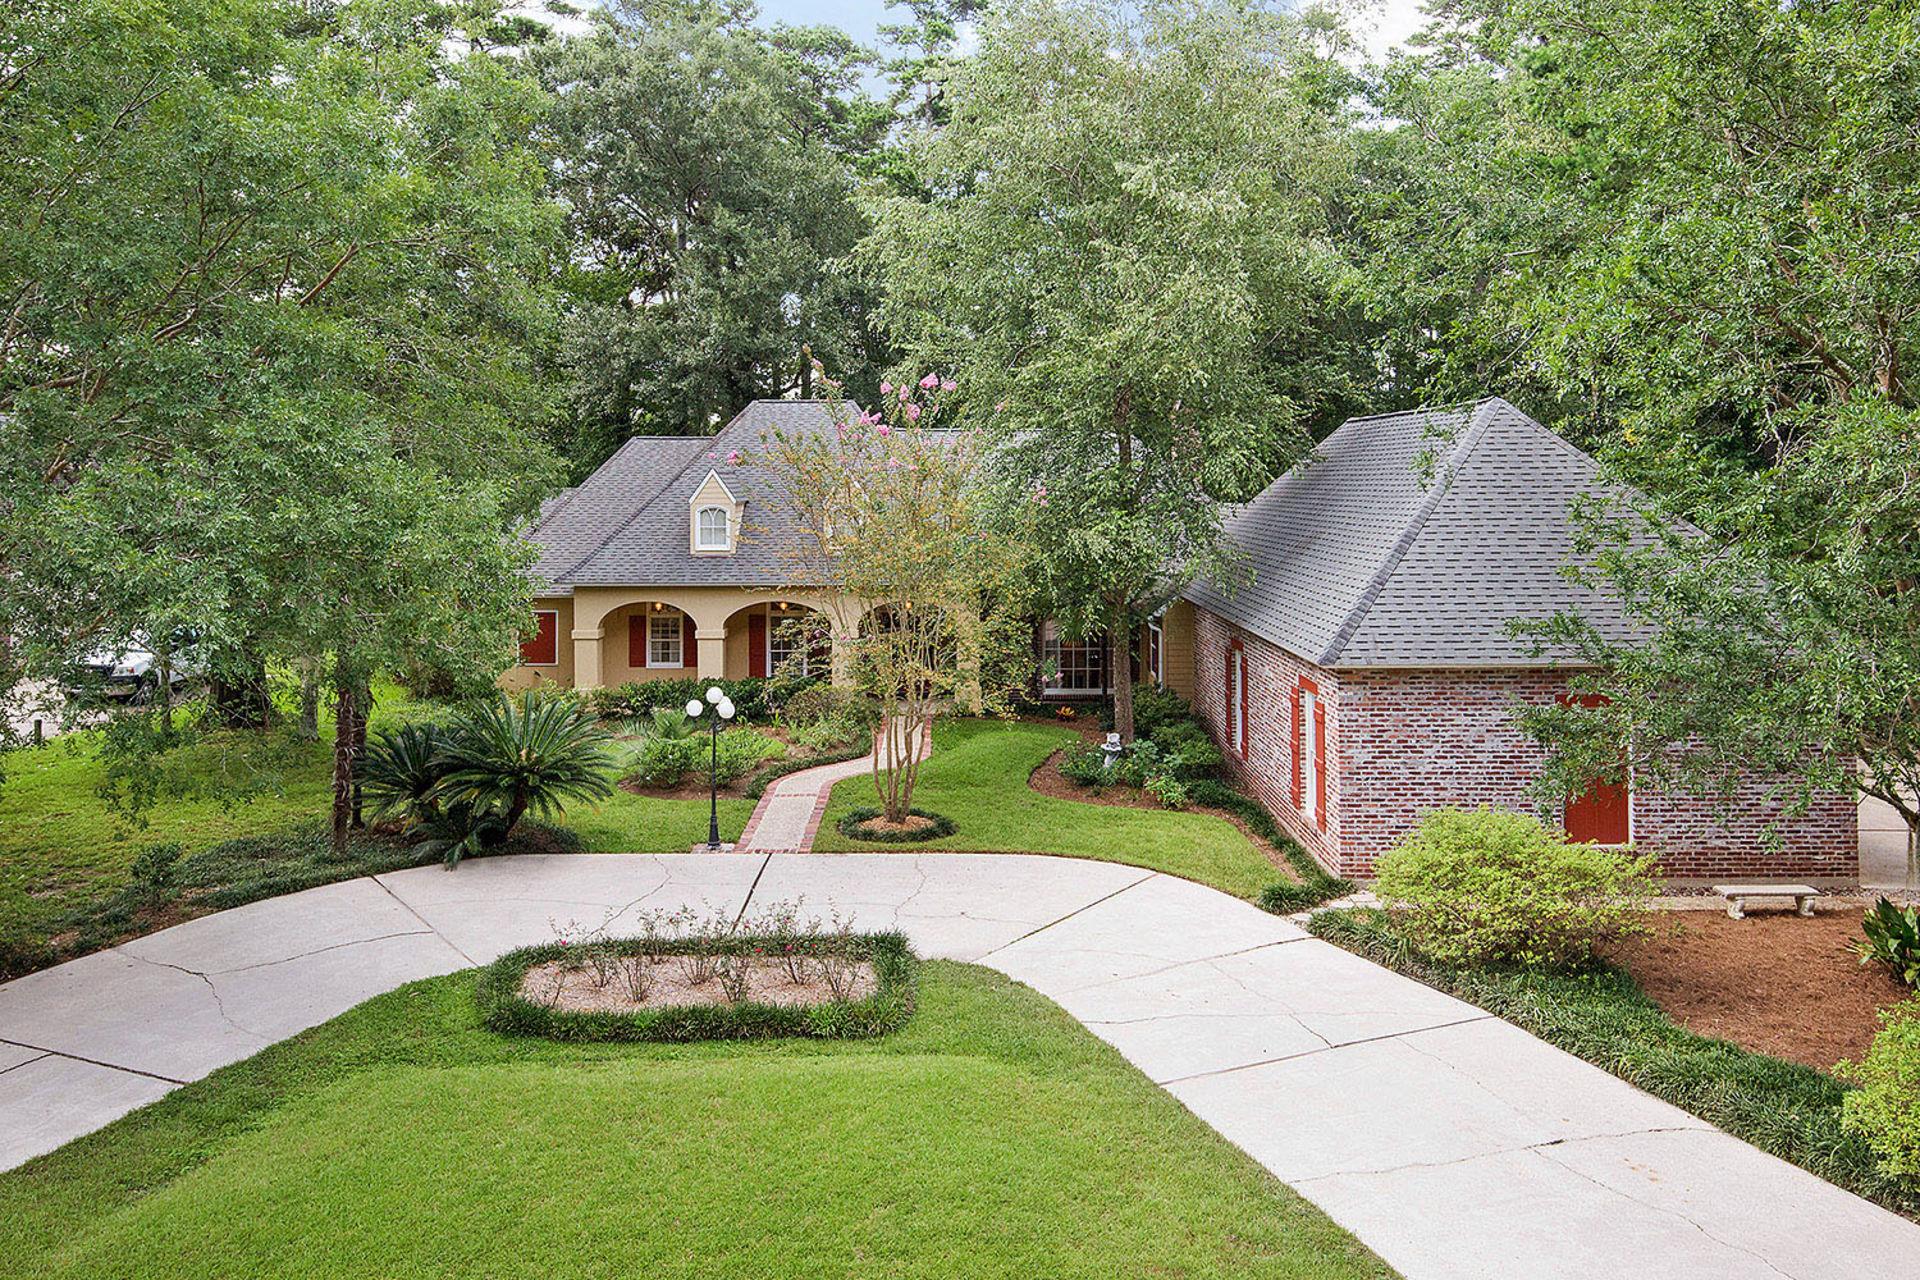 Real Estate Trends in Baton Rouge – $500k-$700k